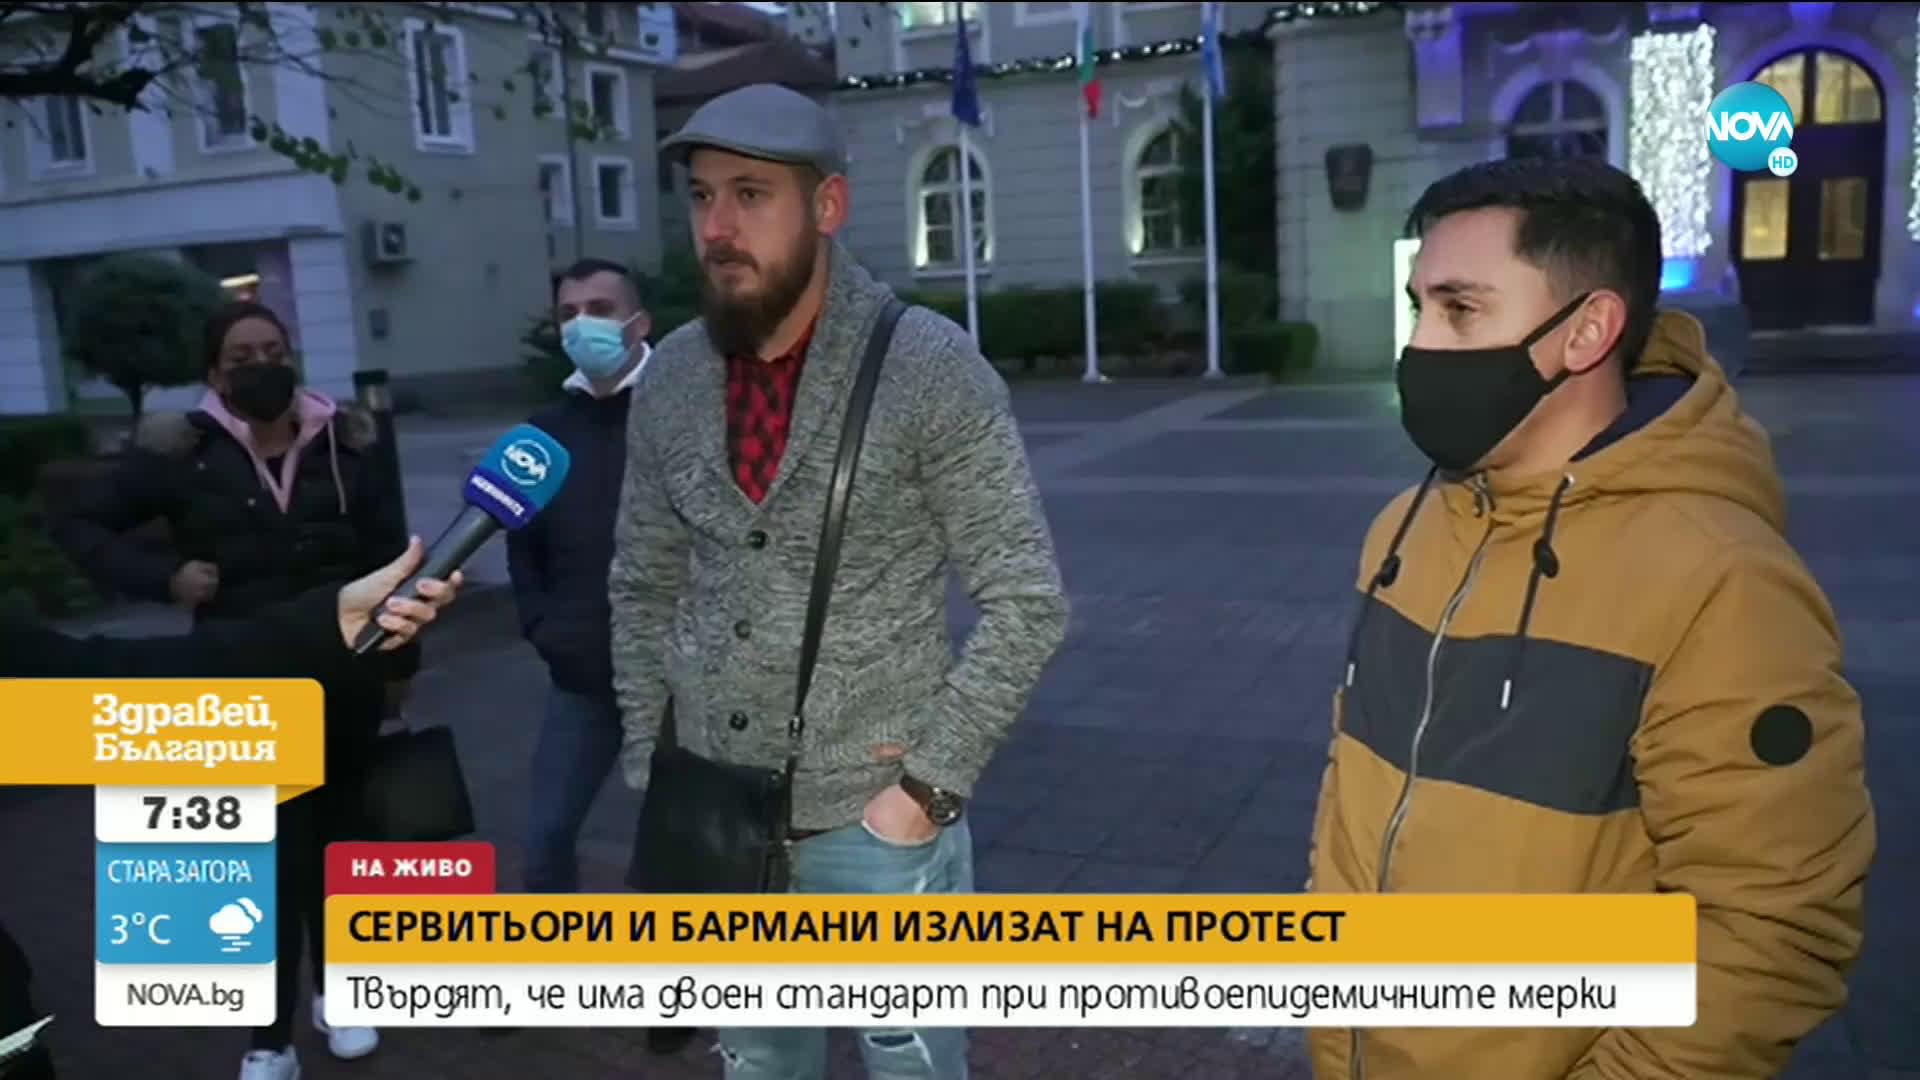 Сервитьори и бармани от Пловдив излизат на протест